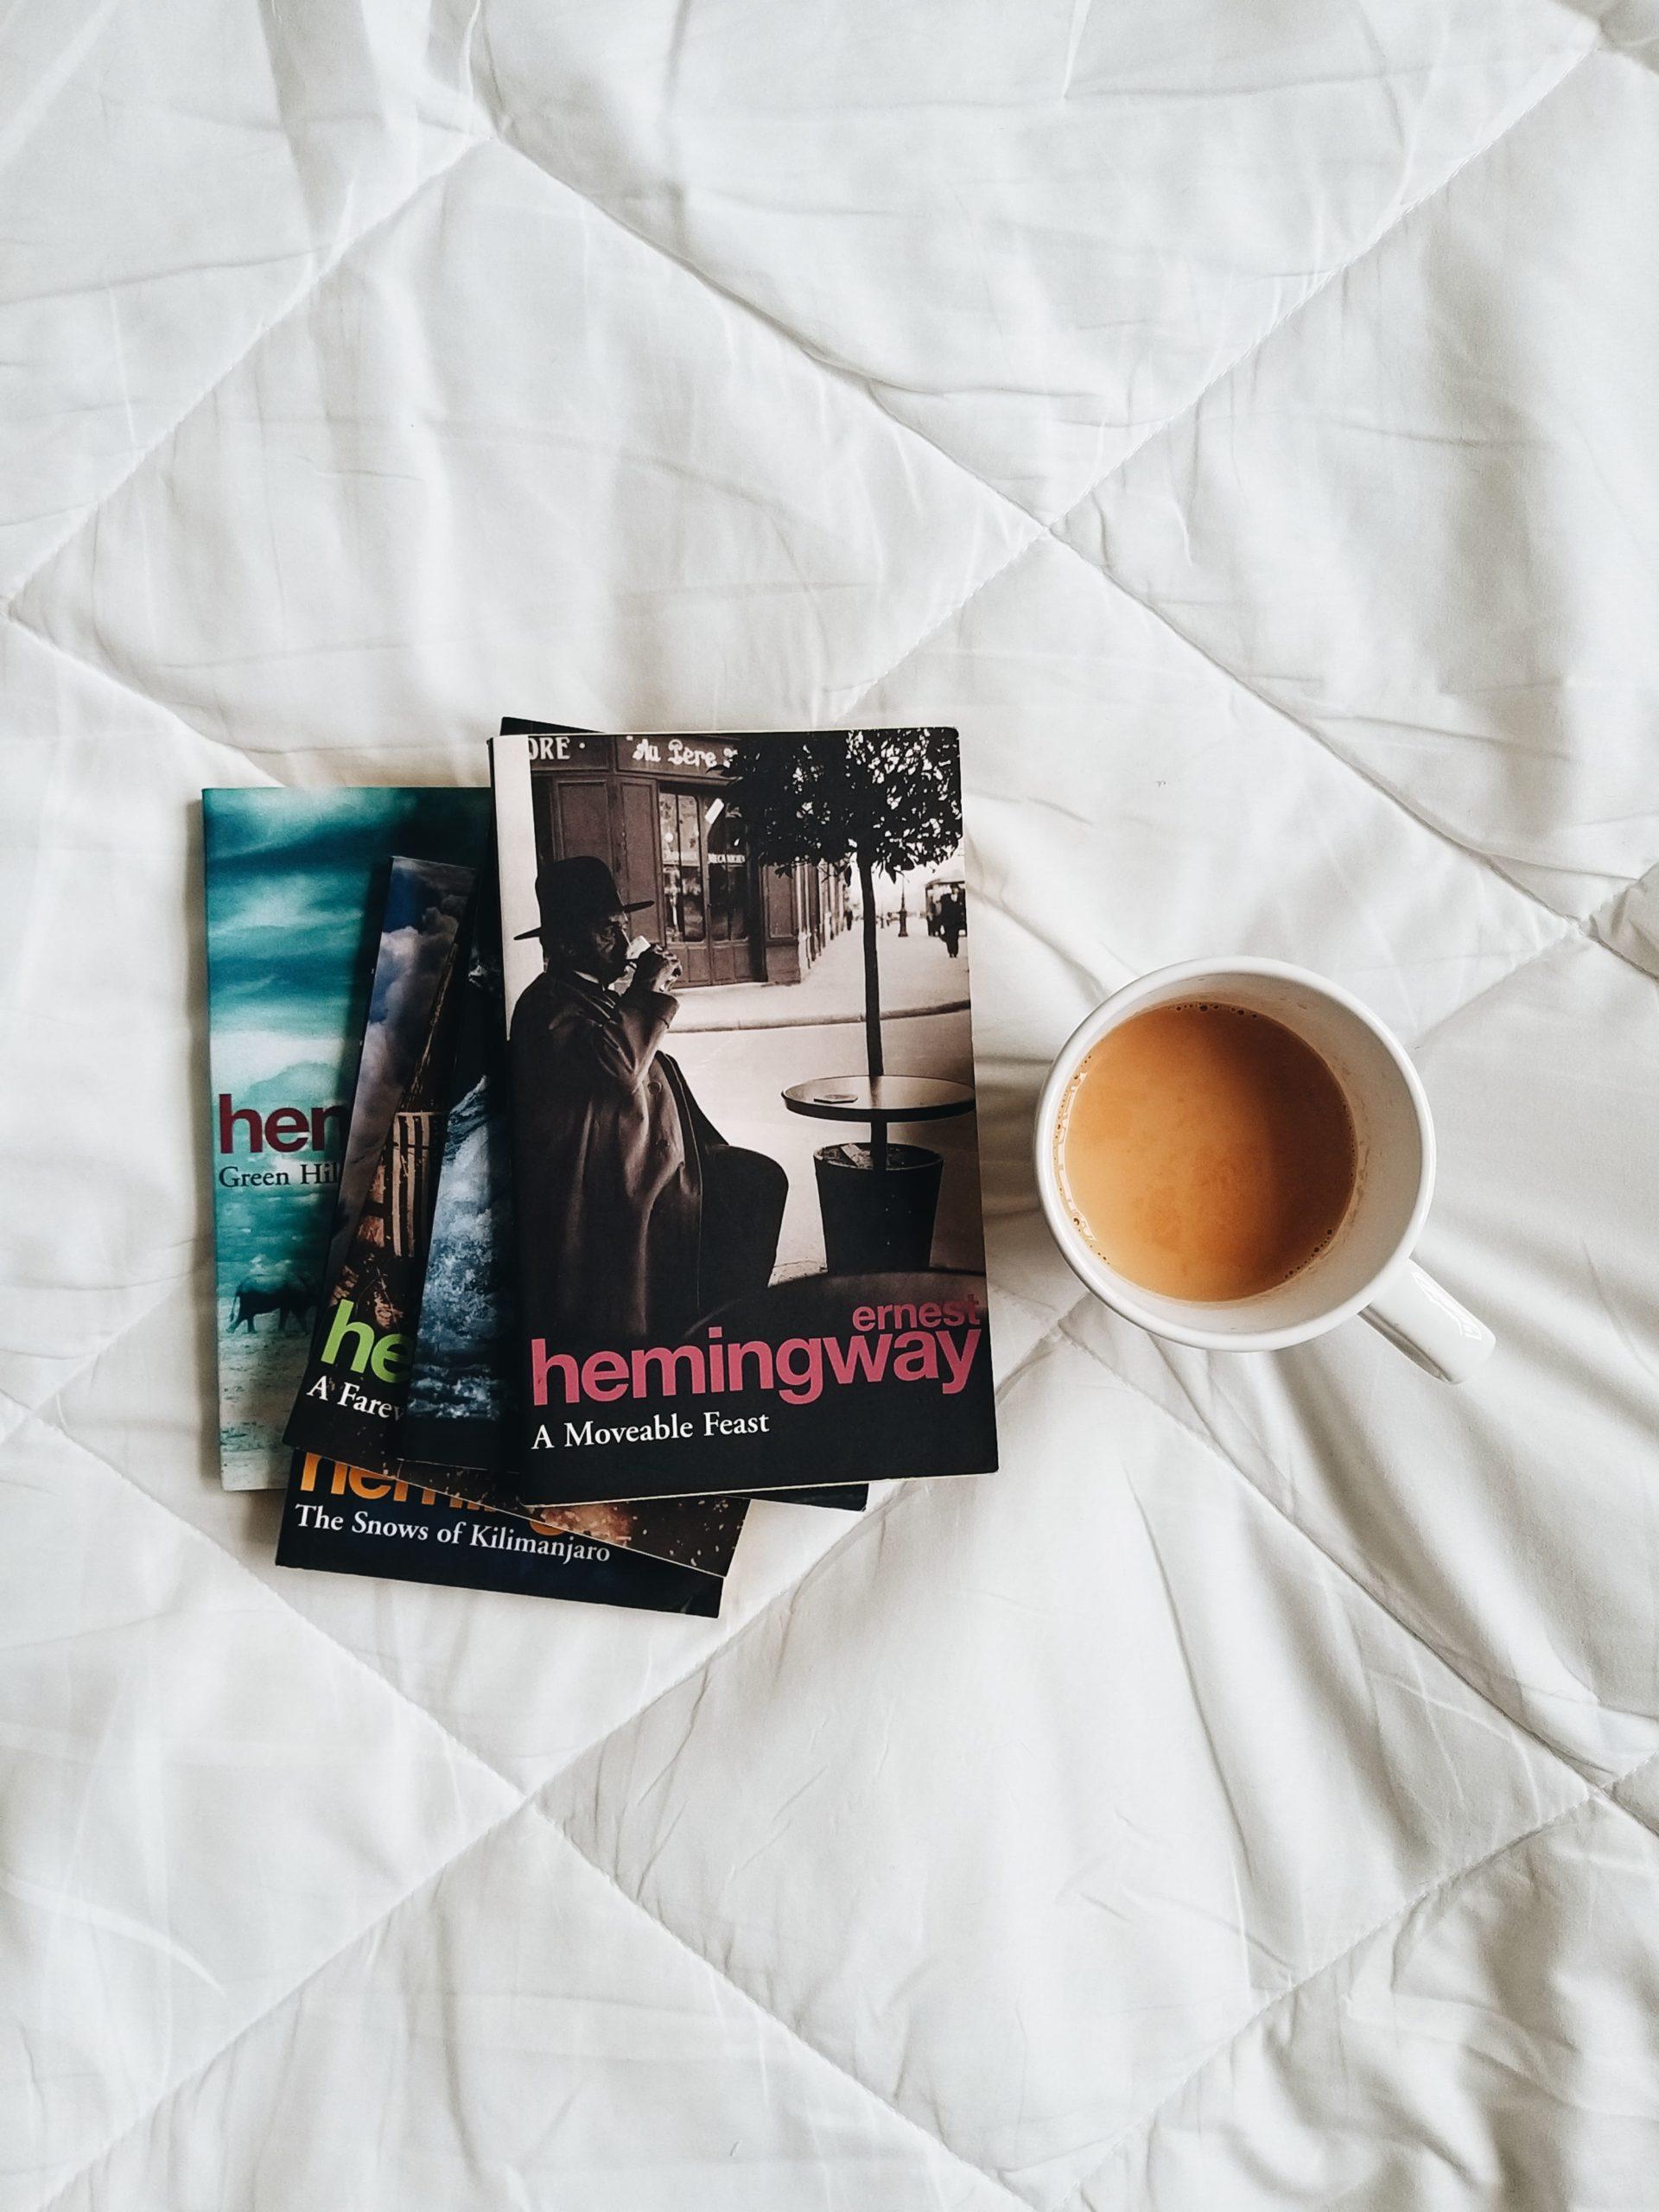 Ernest Hemingway: An Ode to Books I've Read